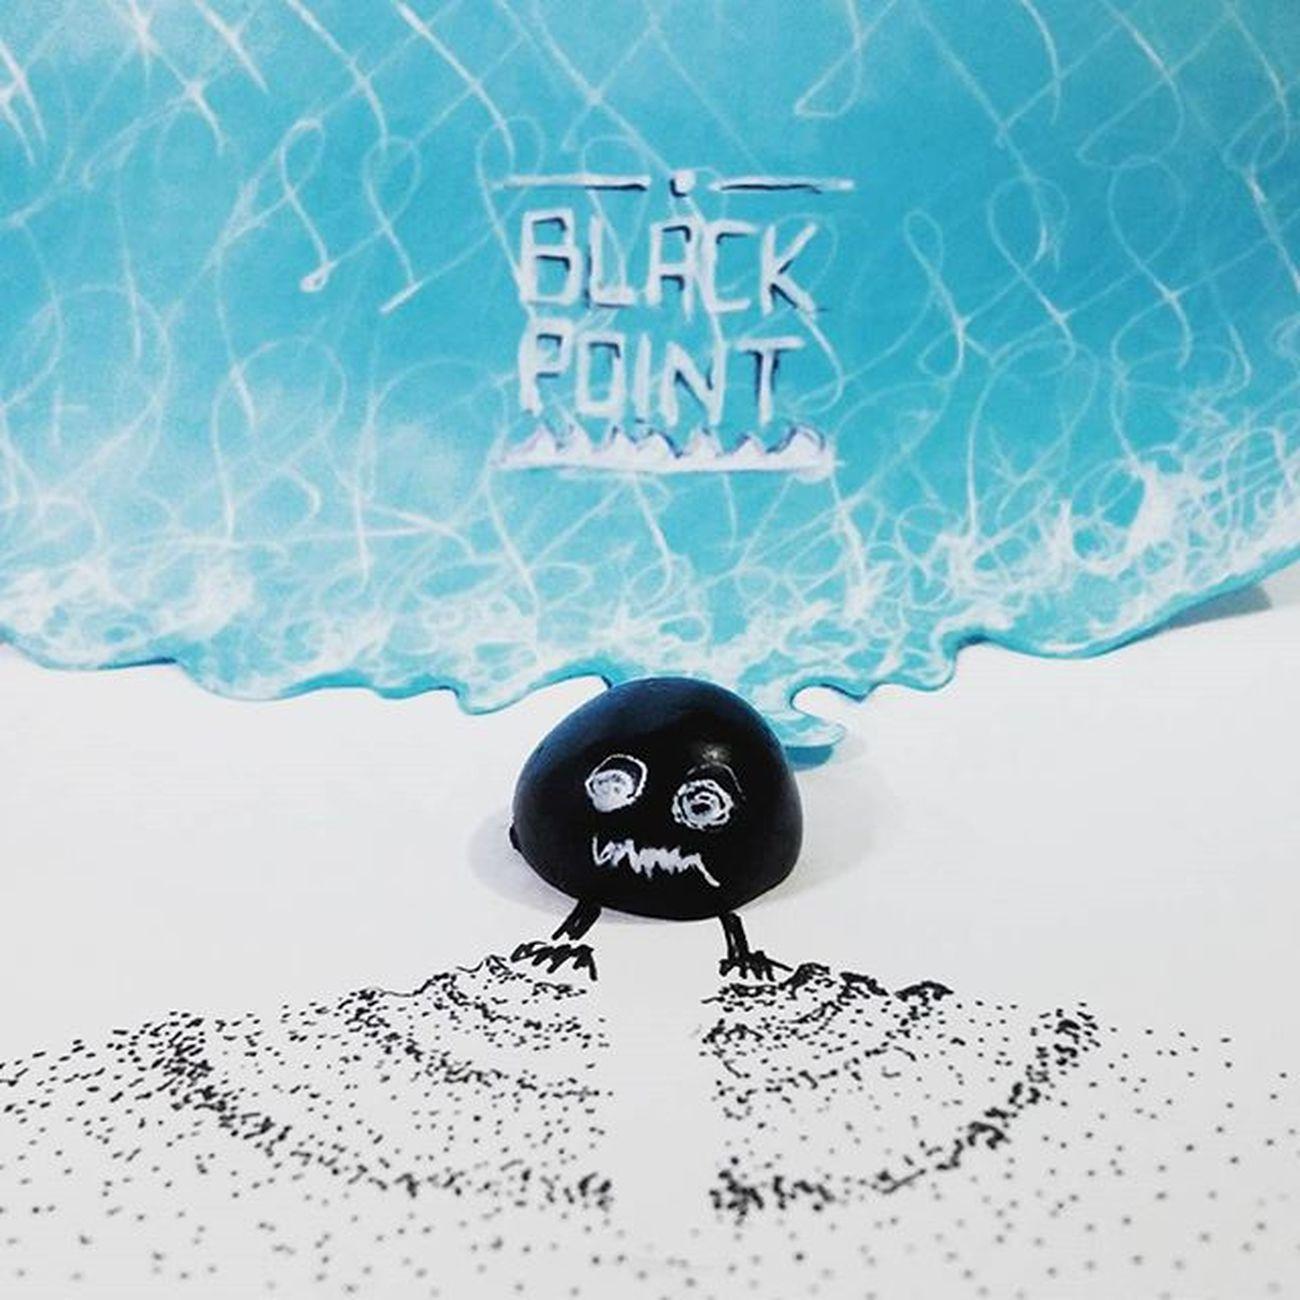 BlackPoint' Blackpoint Black Point Character Animation Graphicdesigner Handmade Typography Art Illustration Illüstrasyon Vscocam VSCO Coldceramic Elyapımı Karakter Artist Illustrator Followme Kumsal Beach Waves Magic